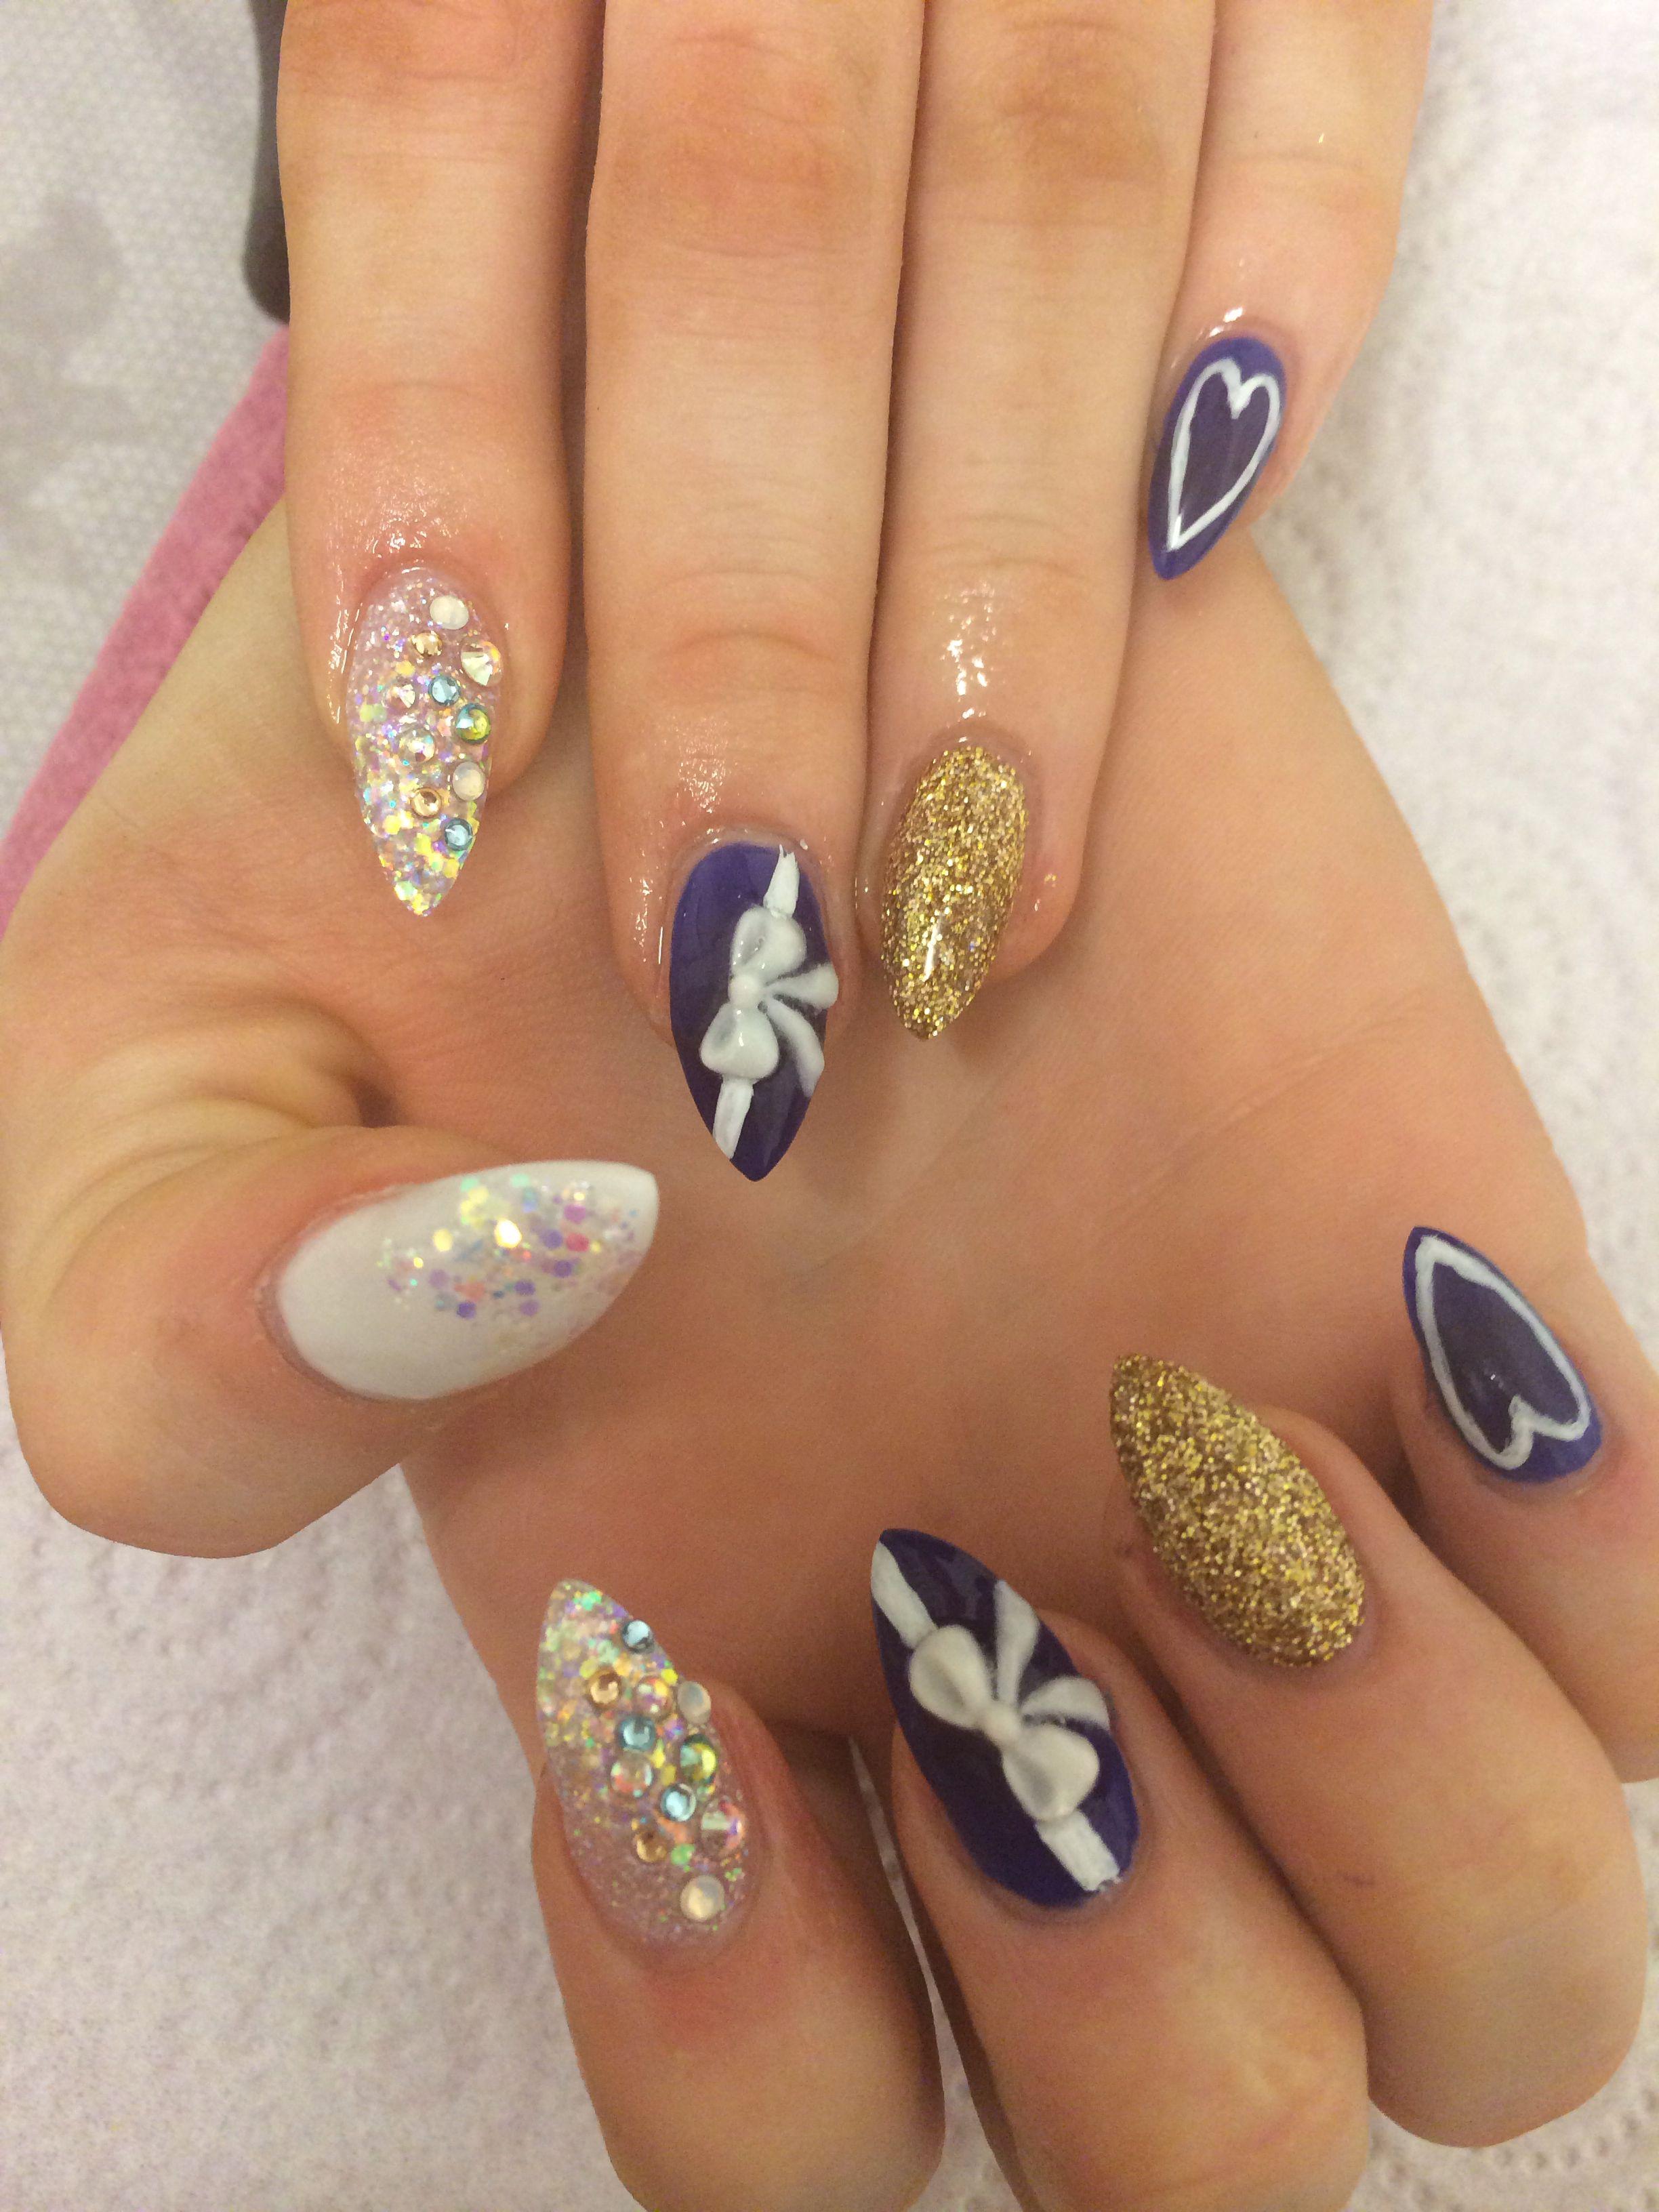 Dark blue tiffany stiletto nails | MY NAIL ART OBSESSION ...